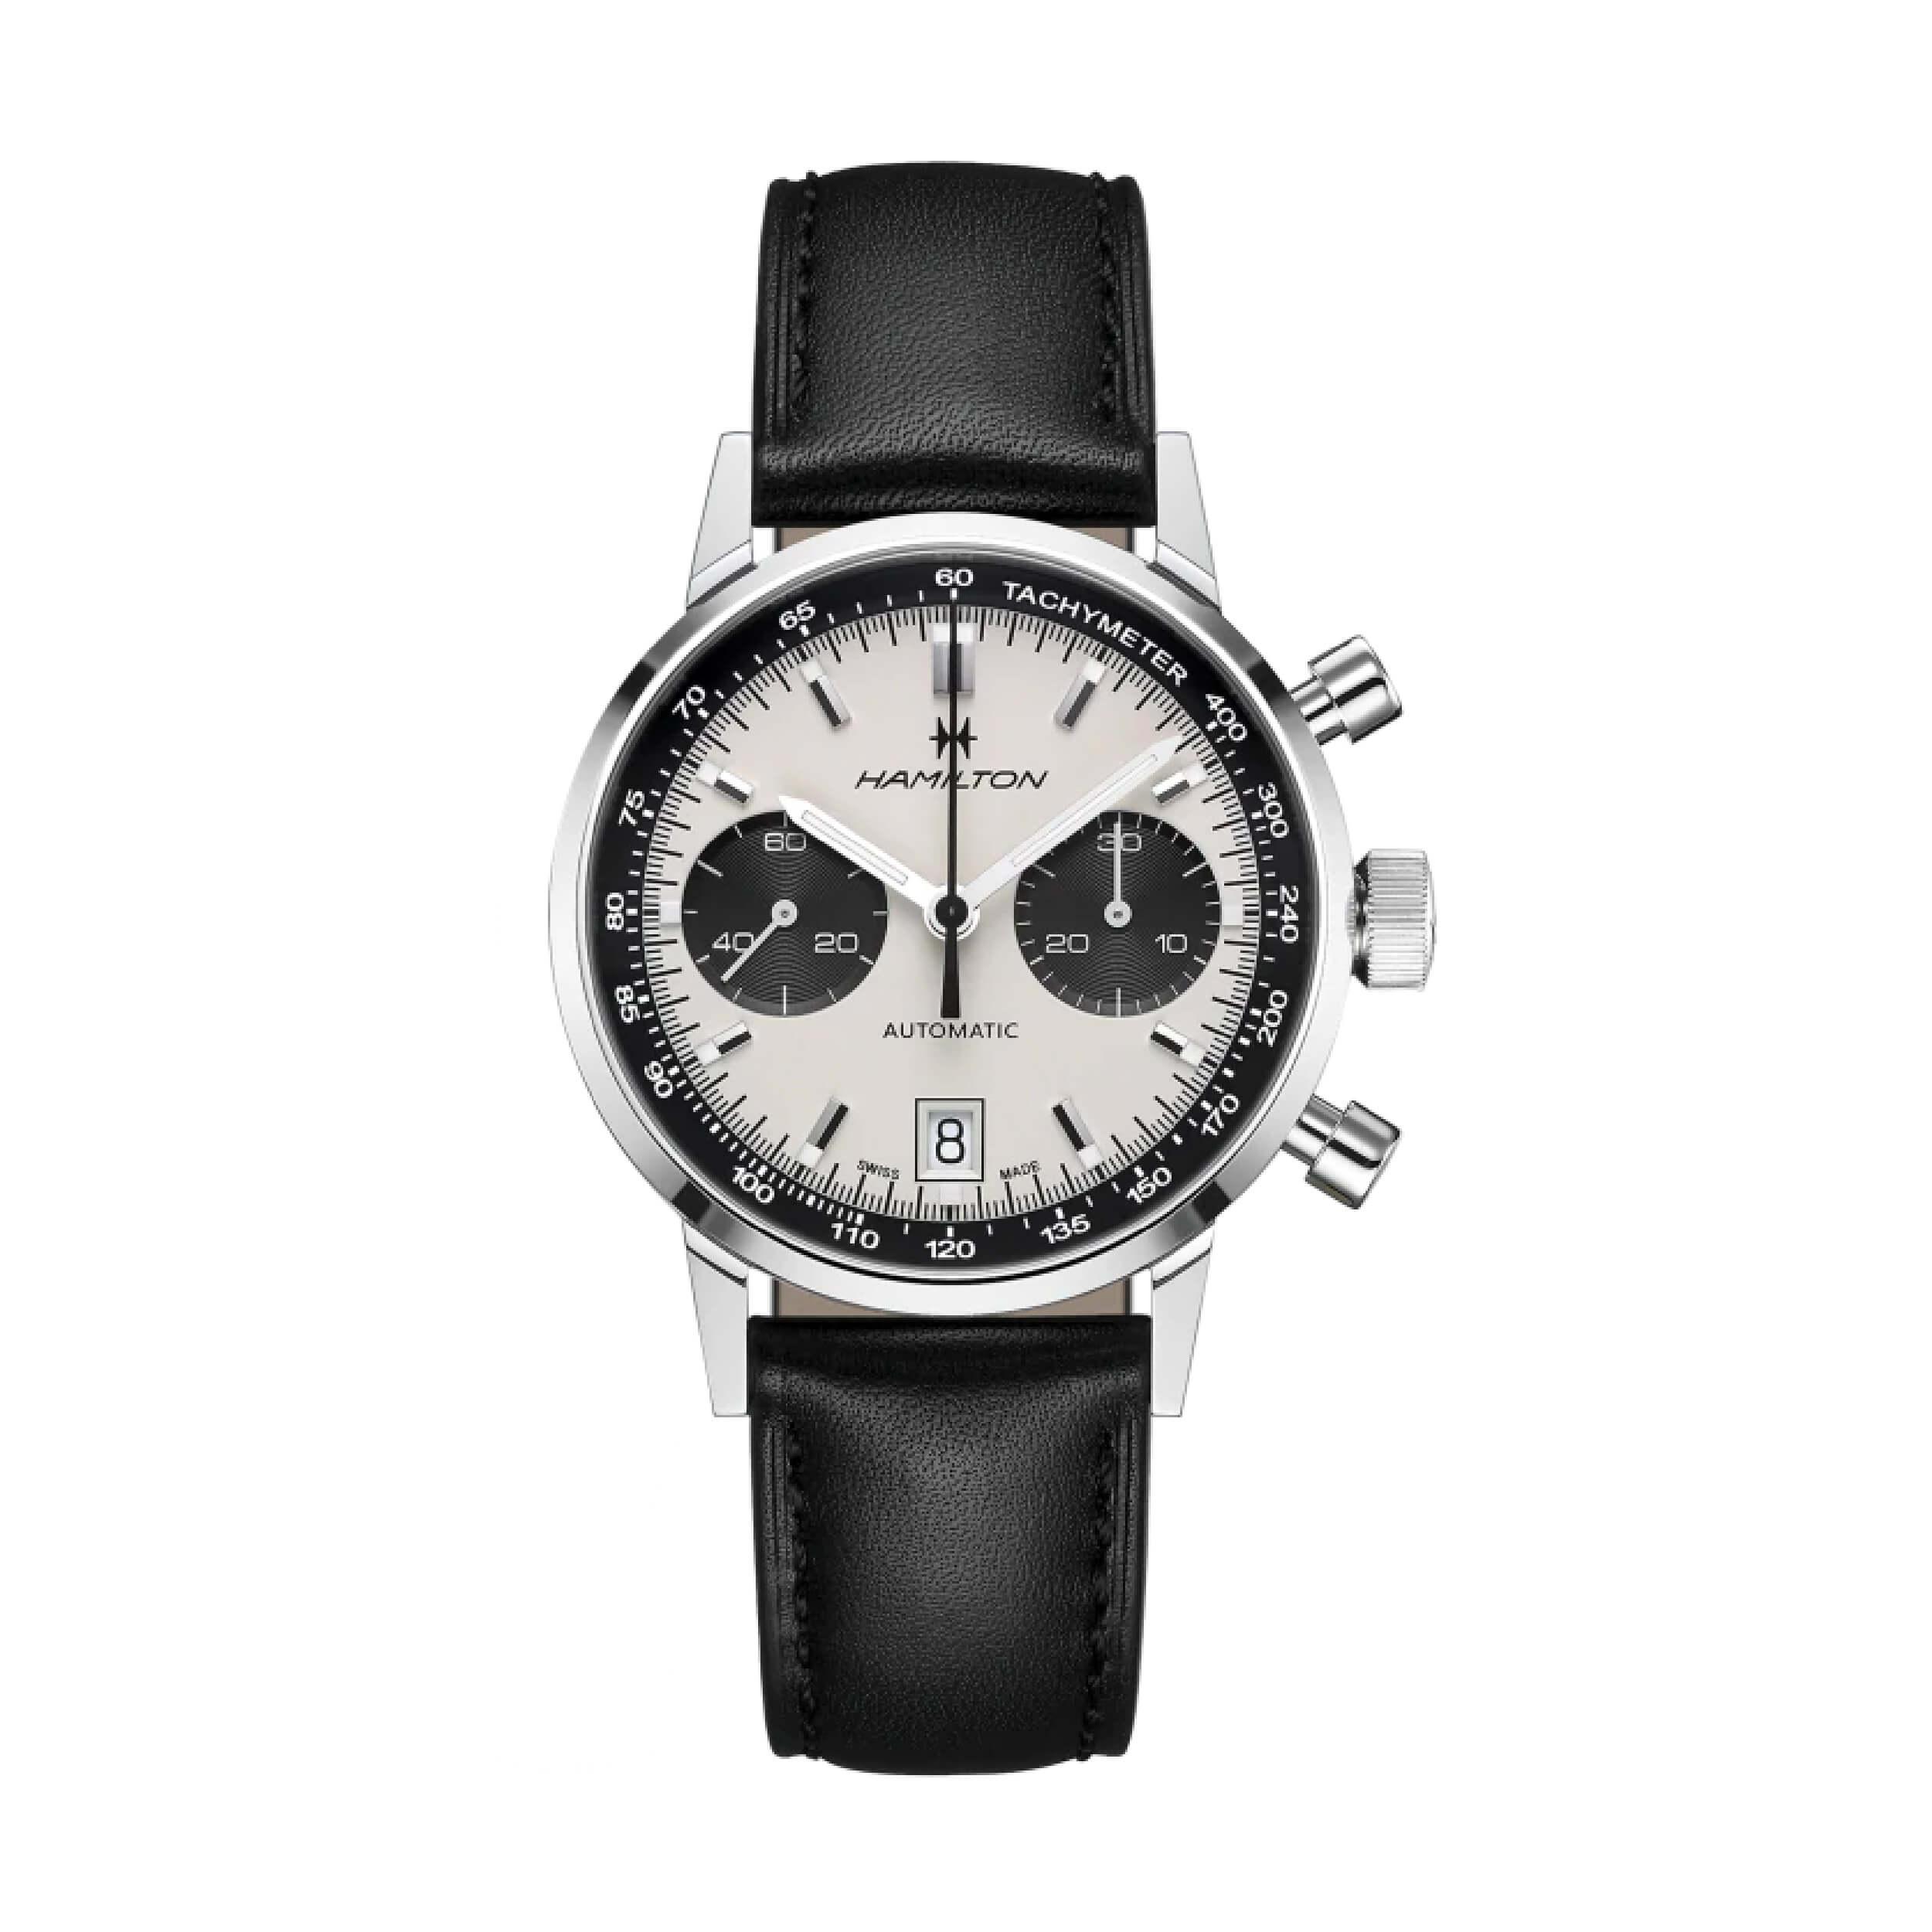 Hamilton American Classic Infra-Matic Auto Chrono | Best Chronograph Watches Under 2000